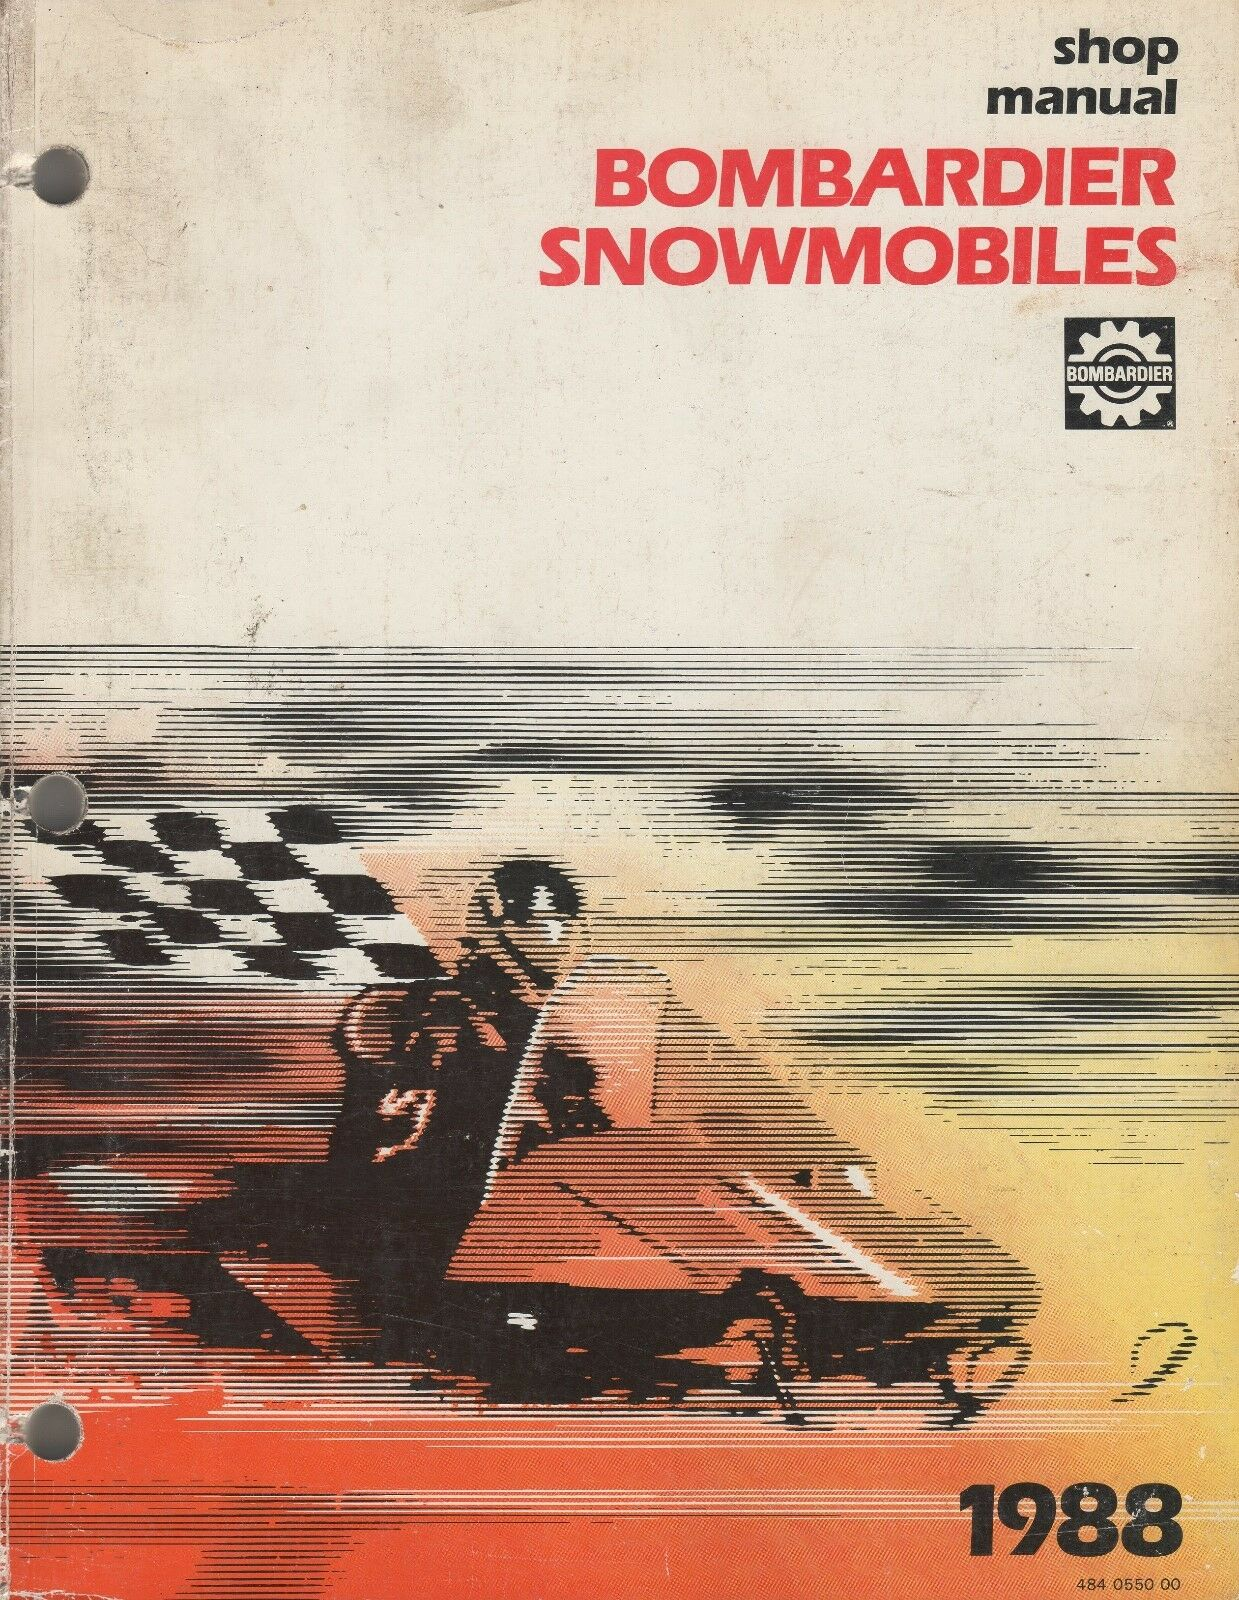 1988 BOMBARDIER SNOWMOBILE SHOP MANUAL 484 0550 00 (145)